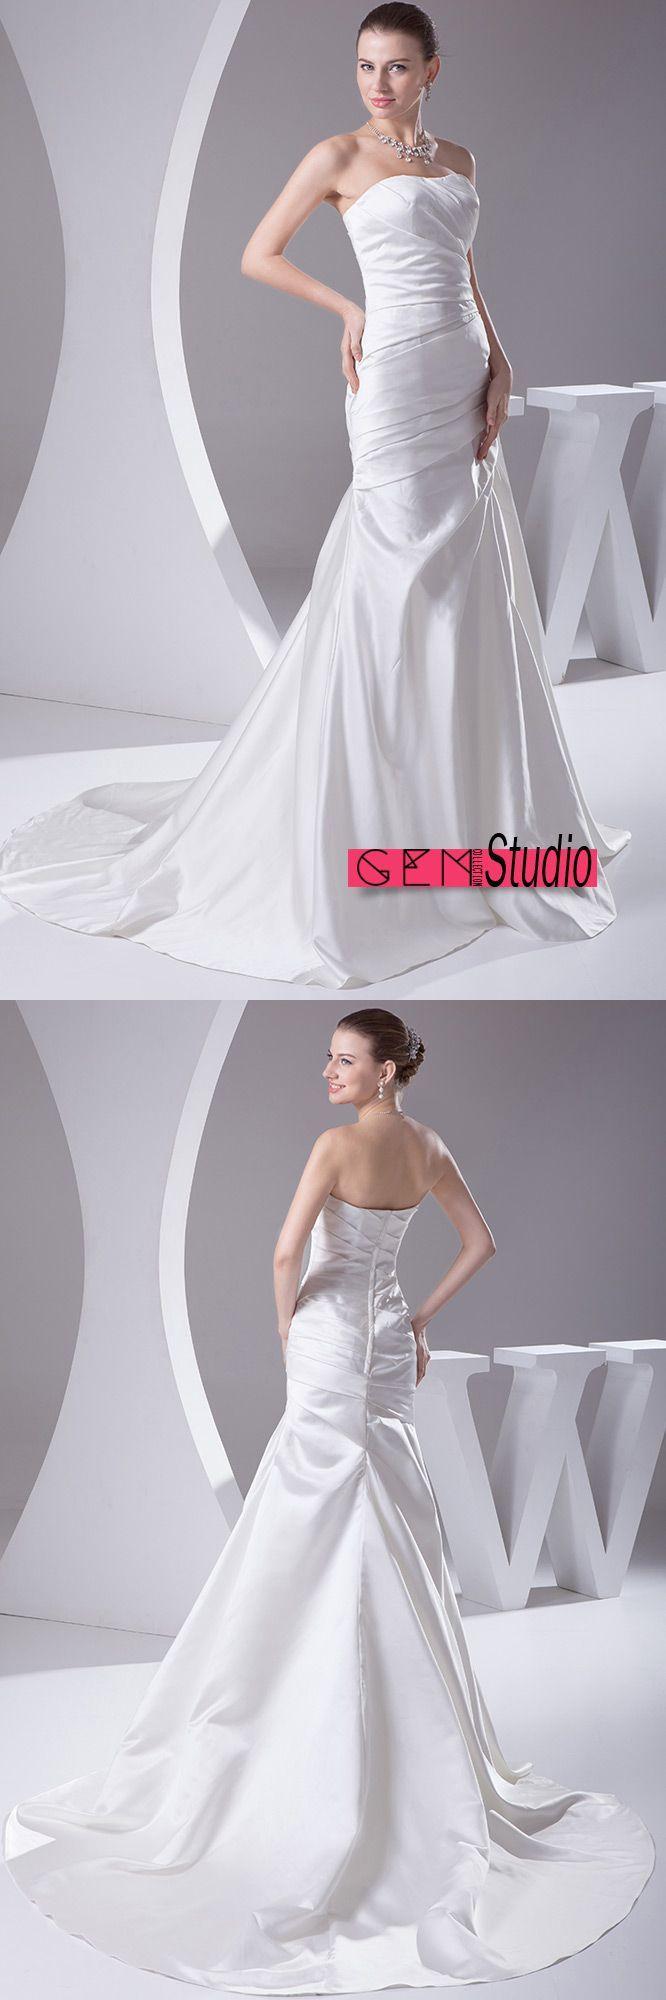 Sheath strapless court train satin wedding dress op